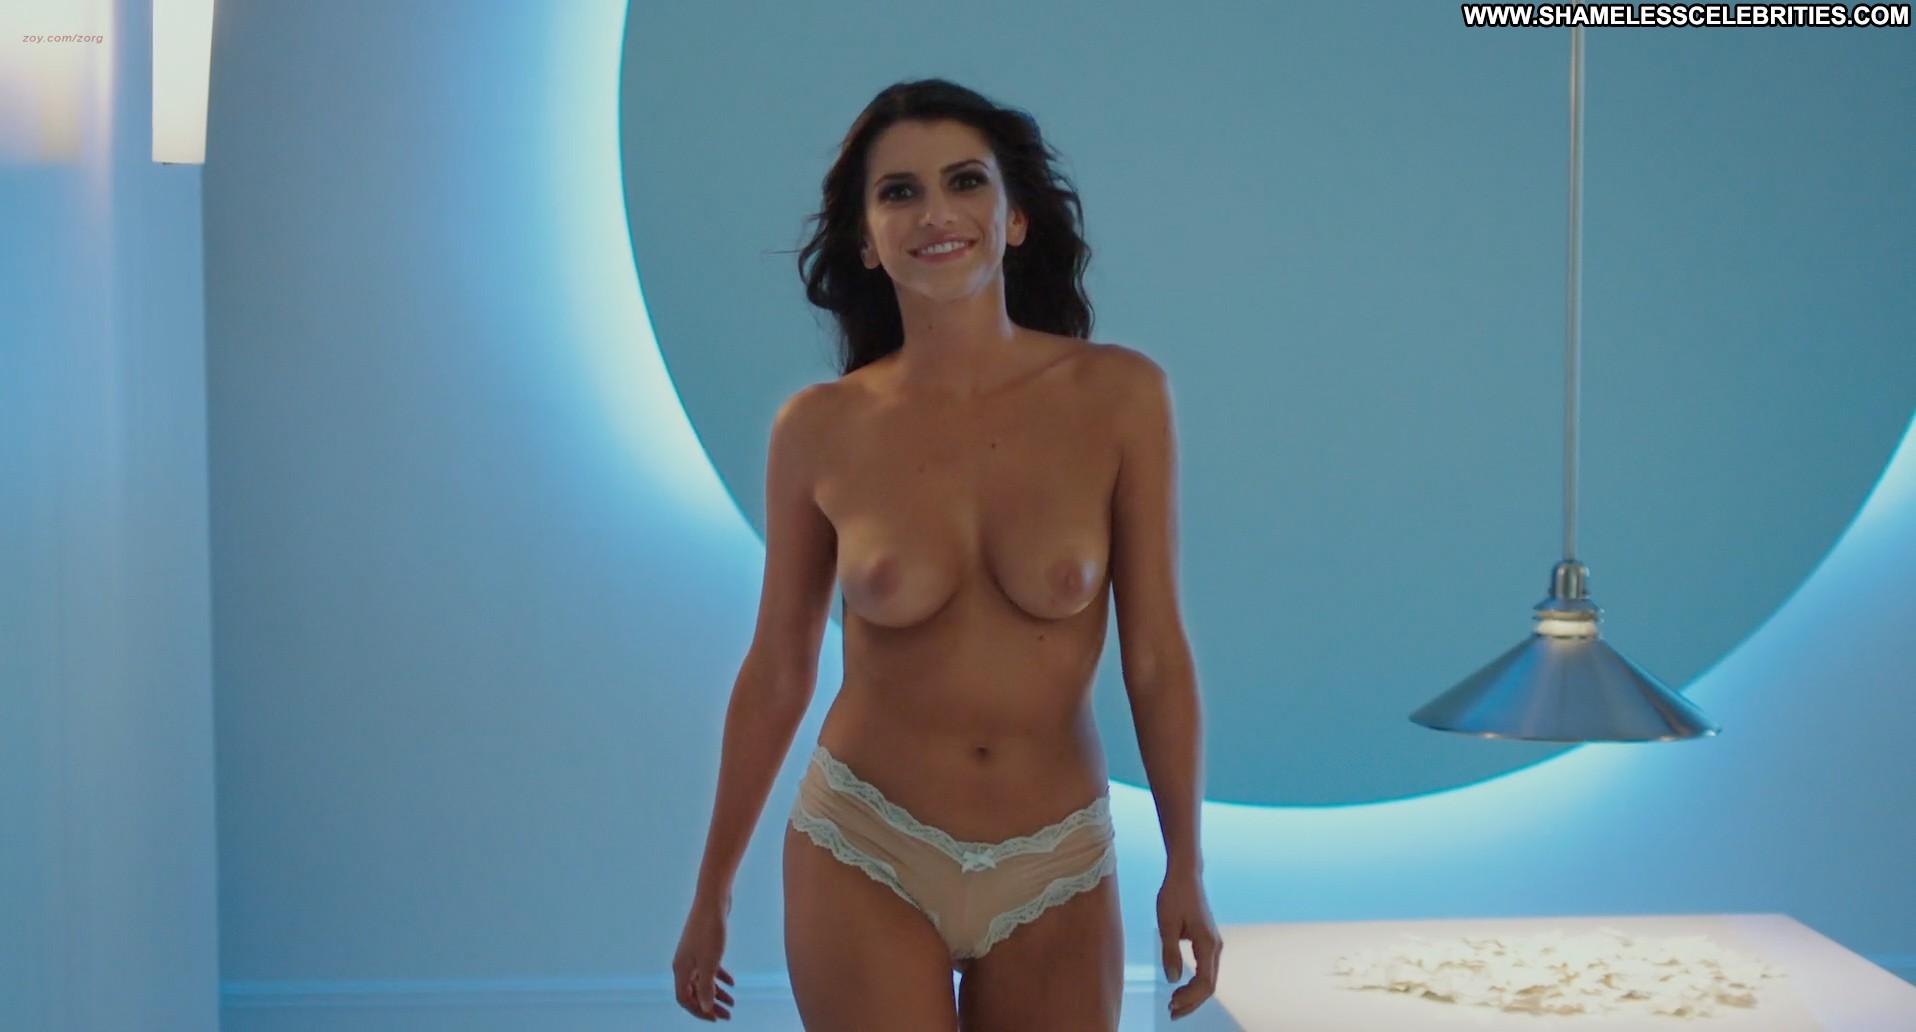 Jessica Pare Nude In Hot Tub Time Machine